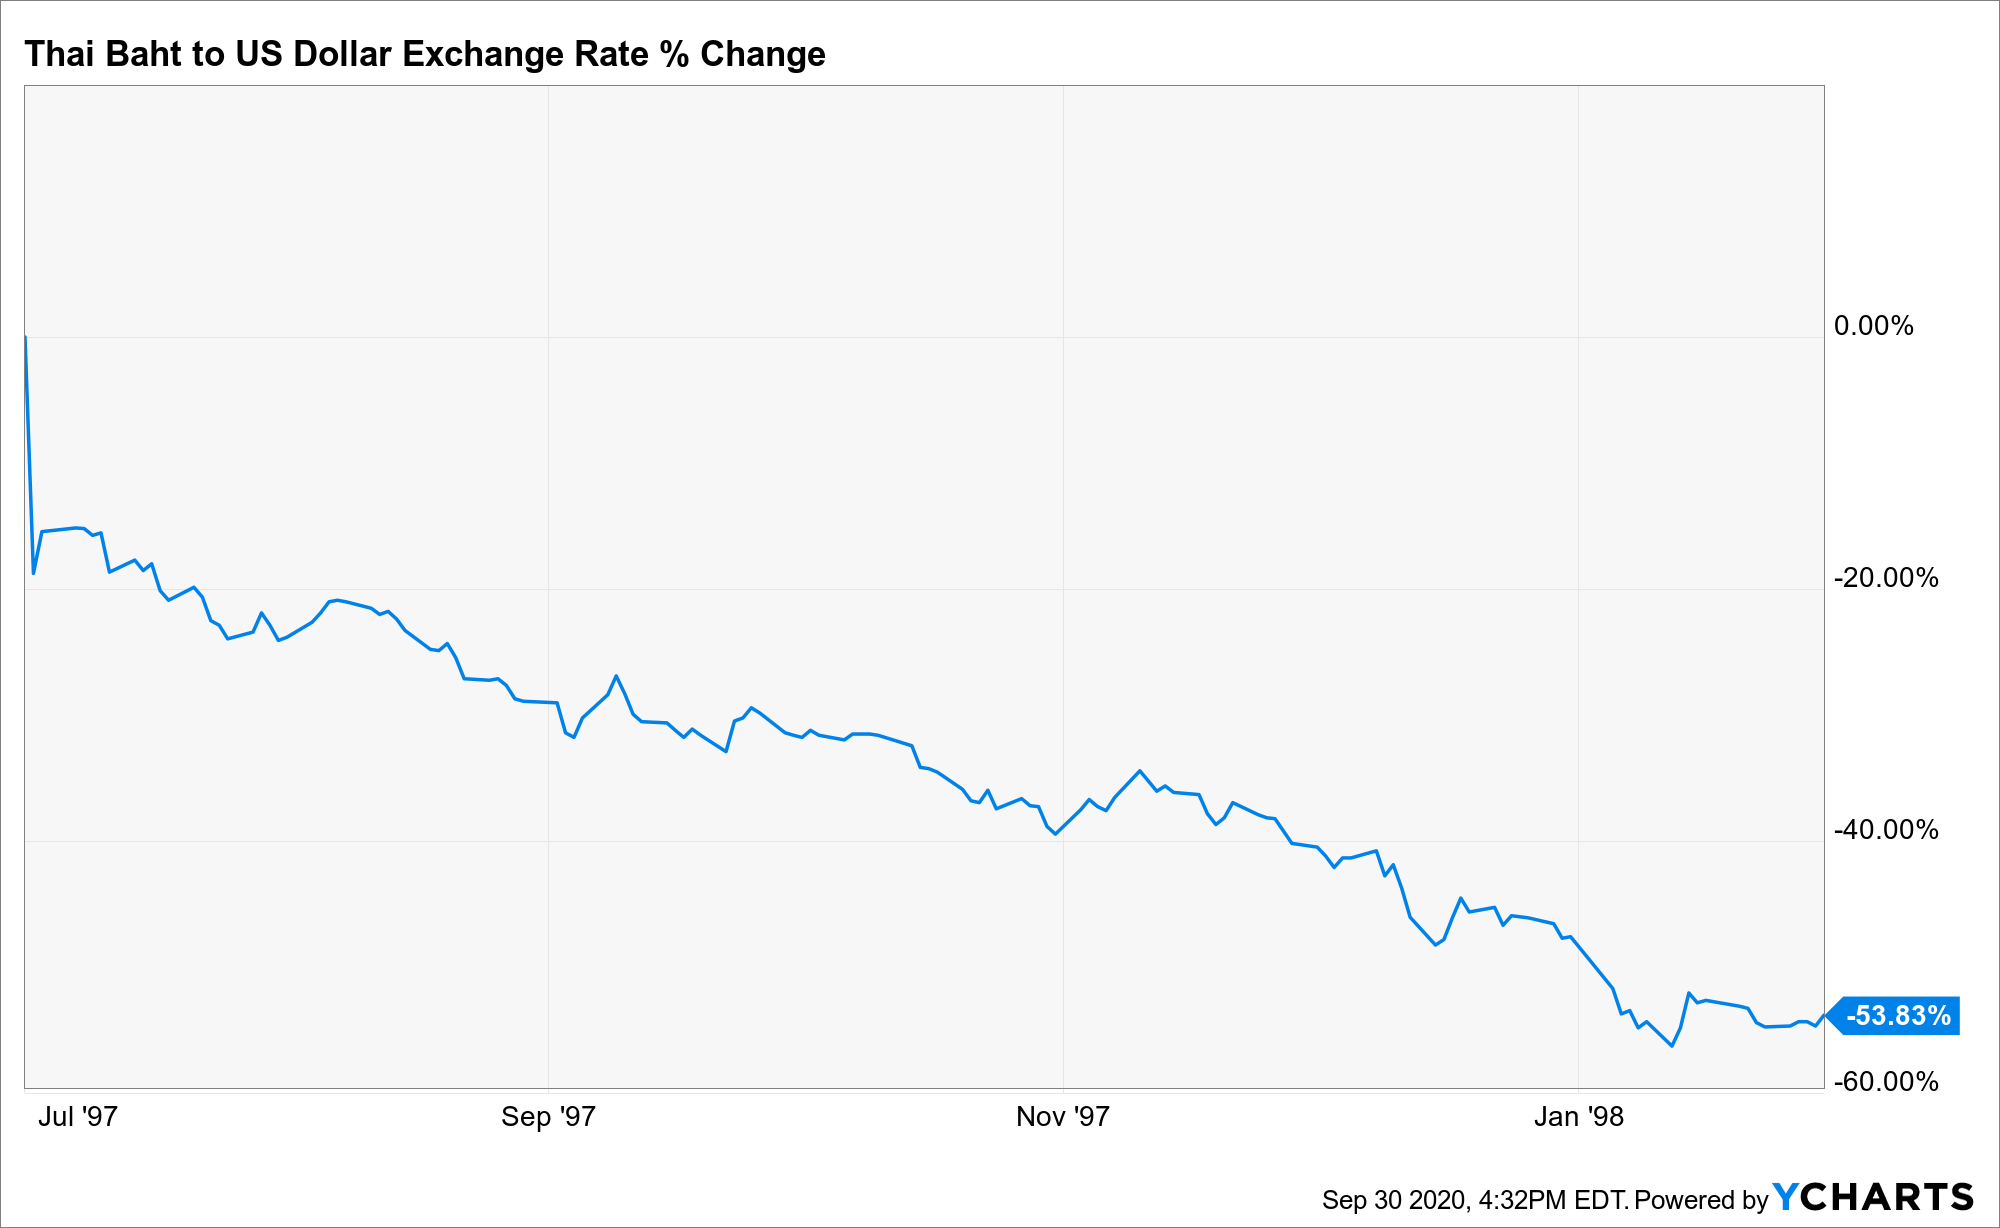 Thai Baht to US Dollar Exchange Rate Chart